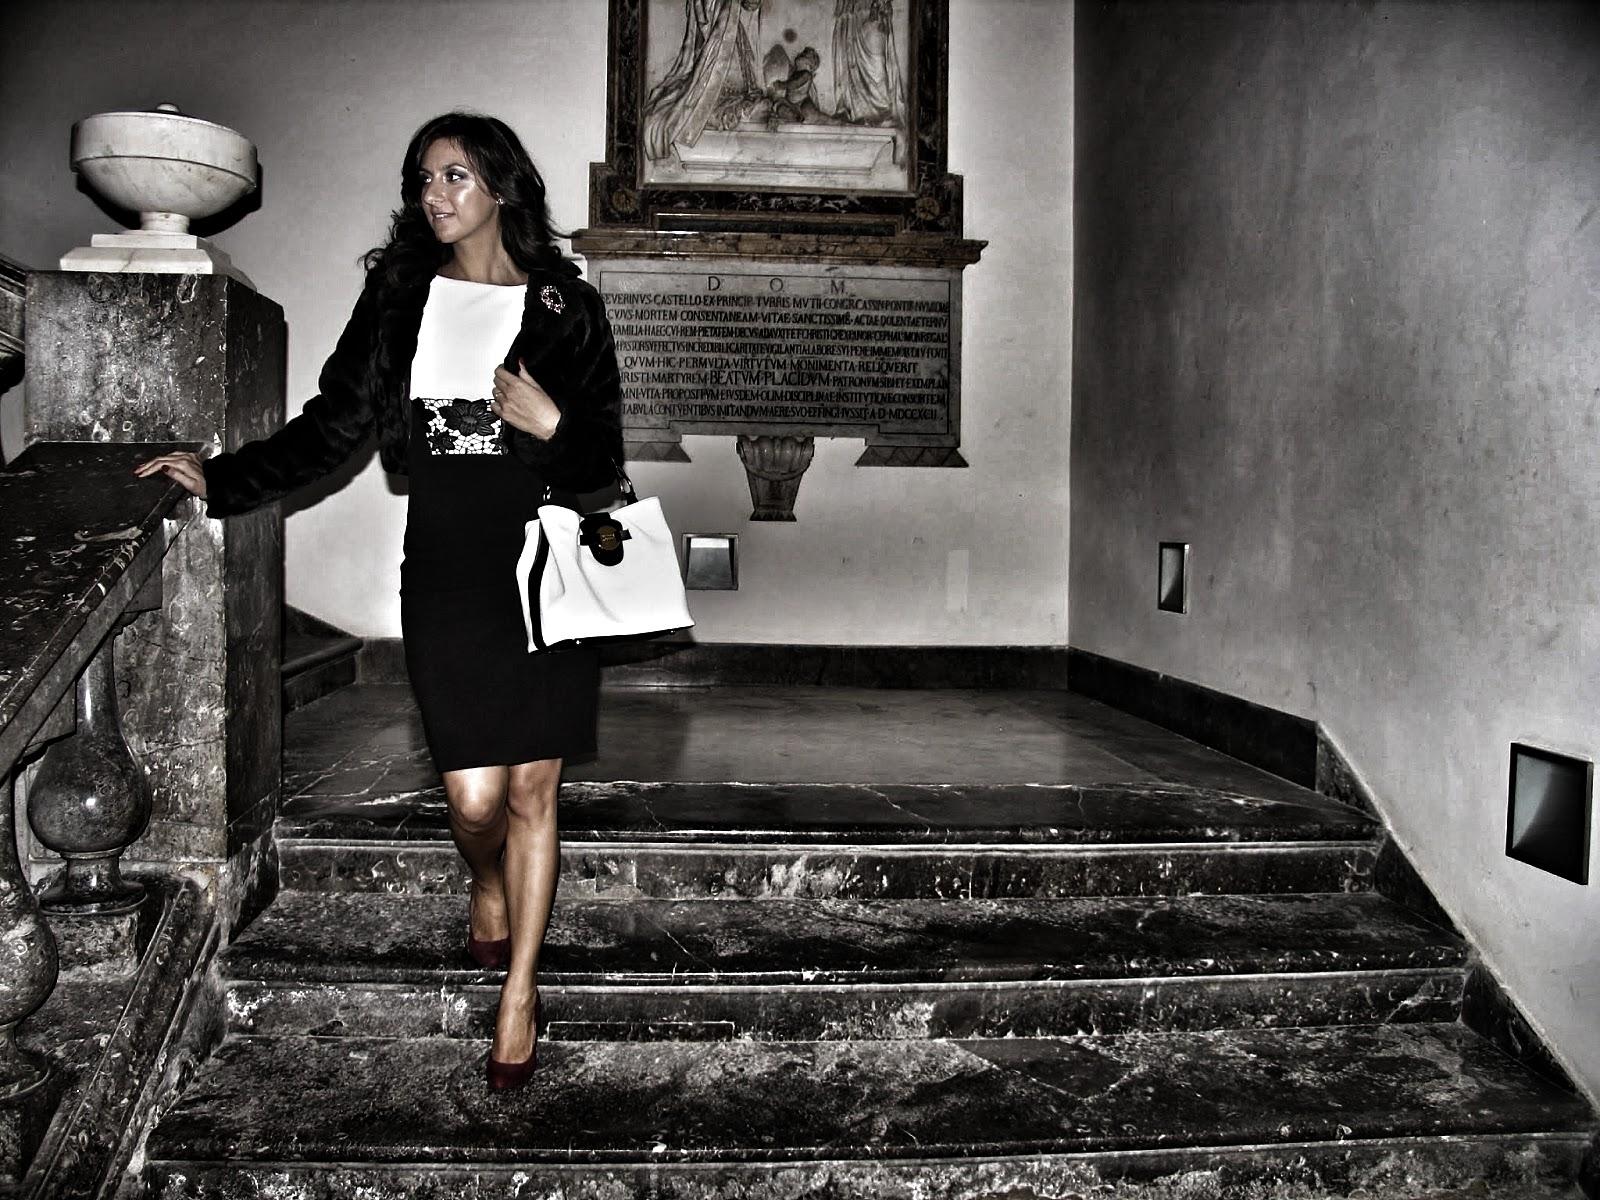 #claudiamagro, fashion, event, galleria, civica, arte, moderna